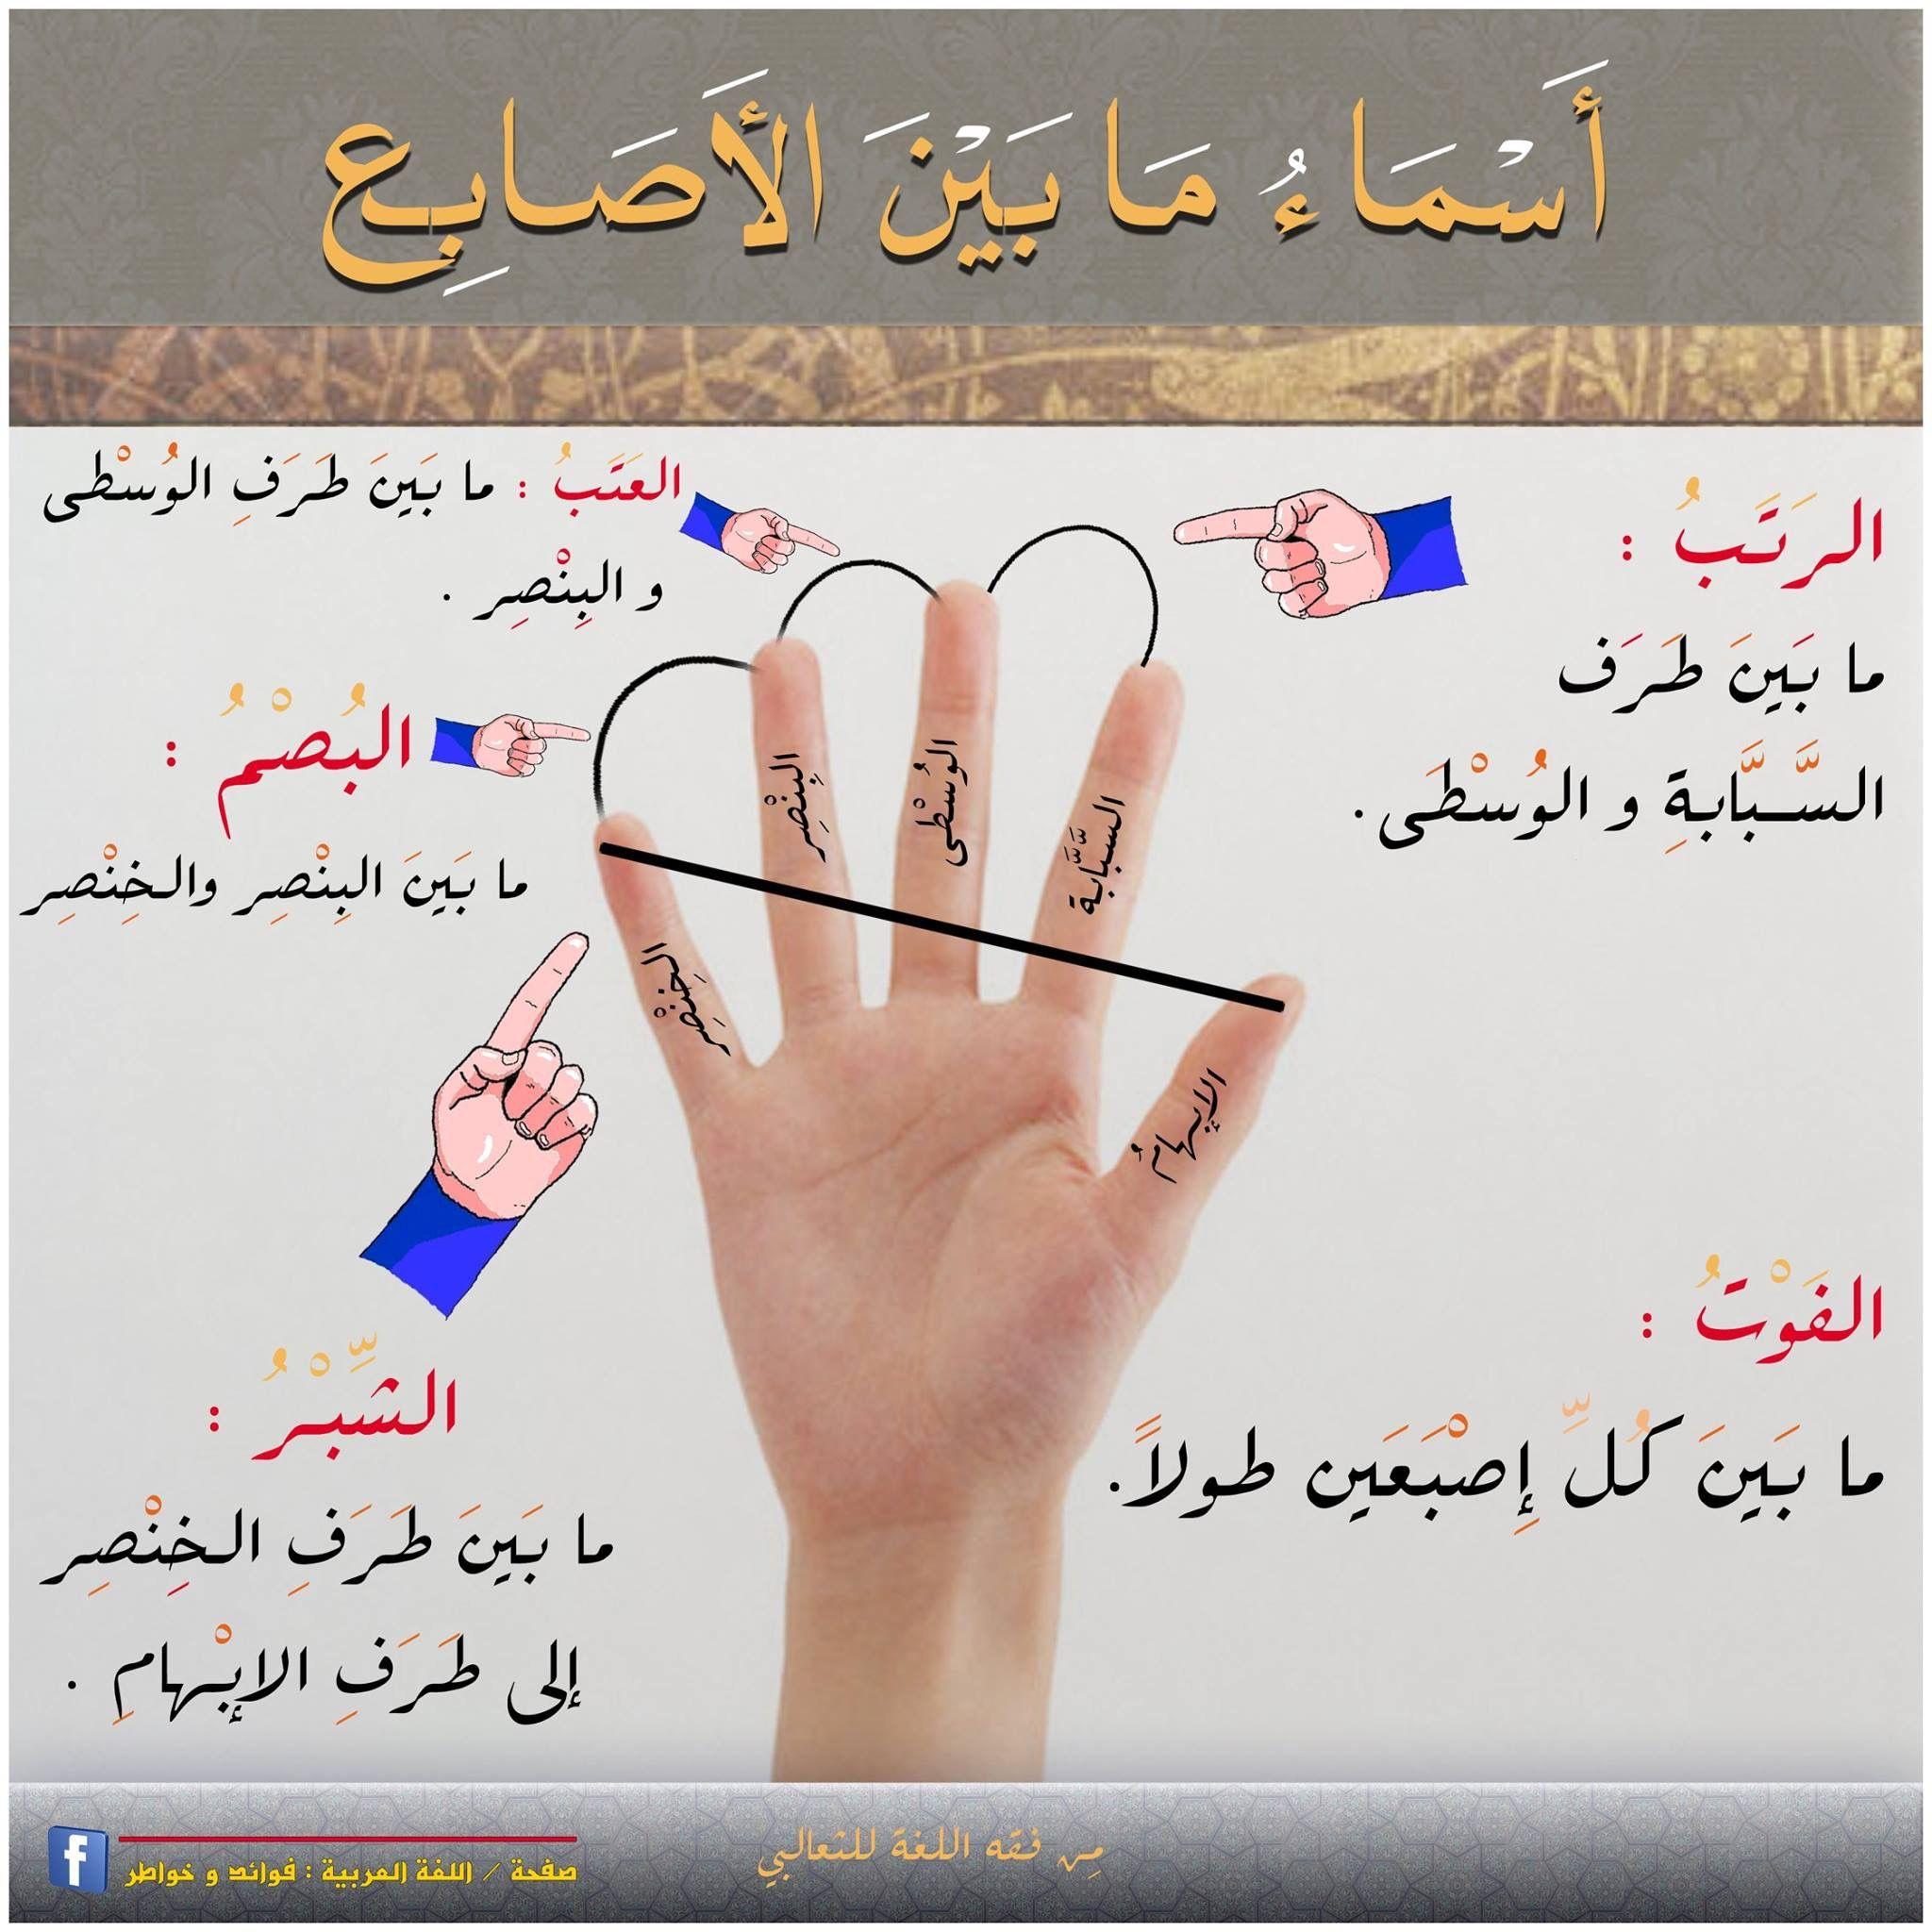 اسماء ما بين الأصابع Arabic Langauge Arabic Language Learn Arabic Alphabet